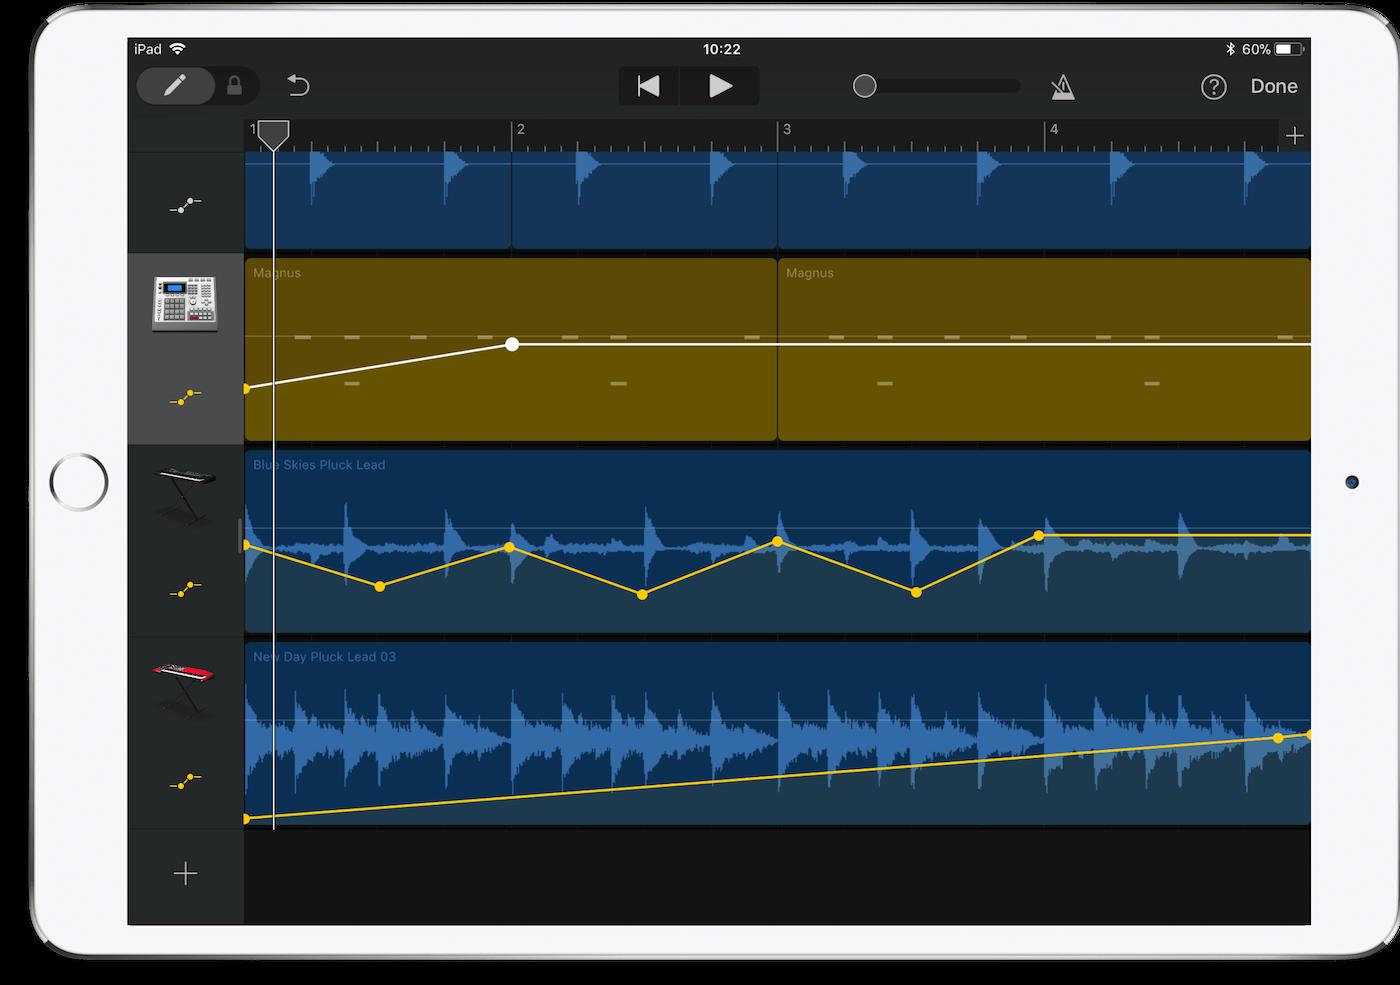 GarageBand Automation on iOS on an iPad